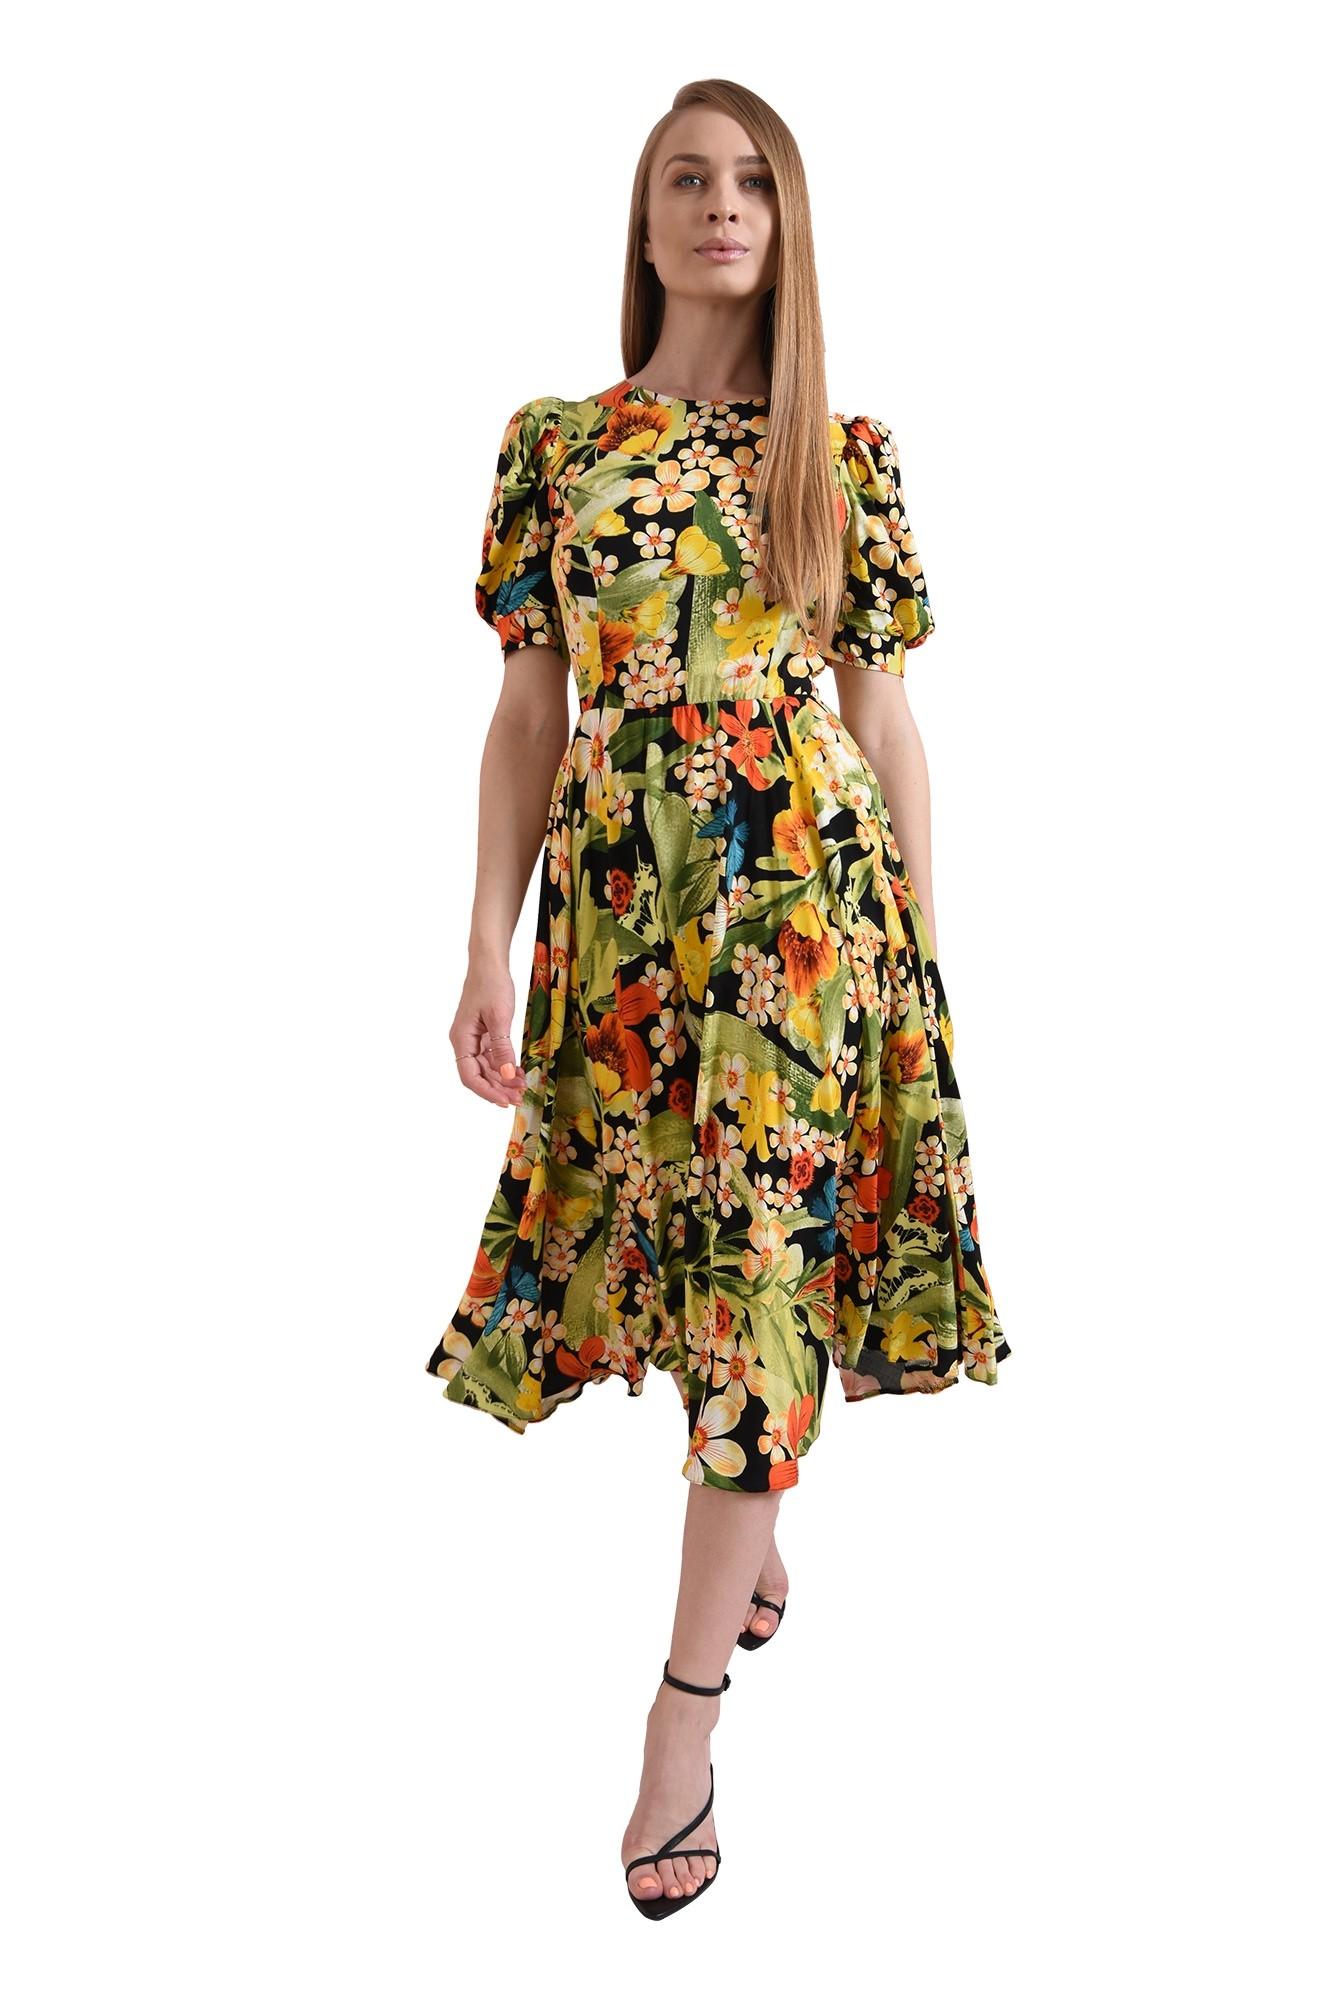 3 - rochie cu imprimeu, evazata, Poema